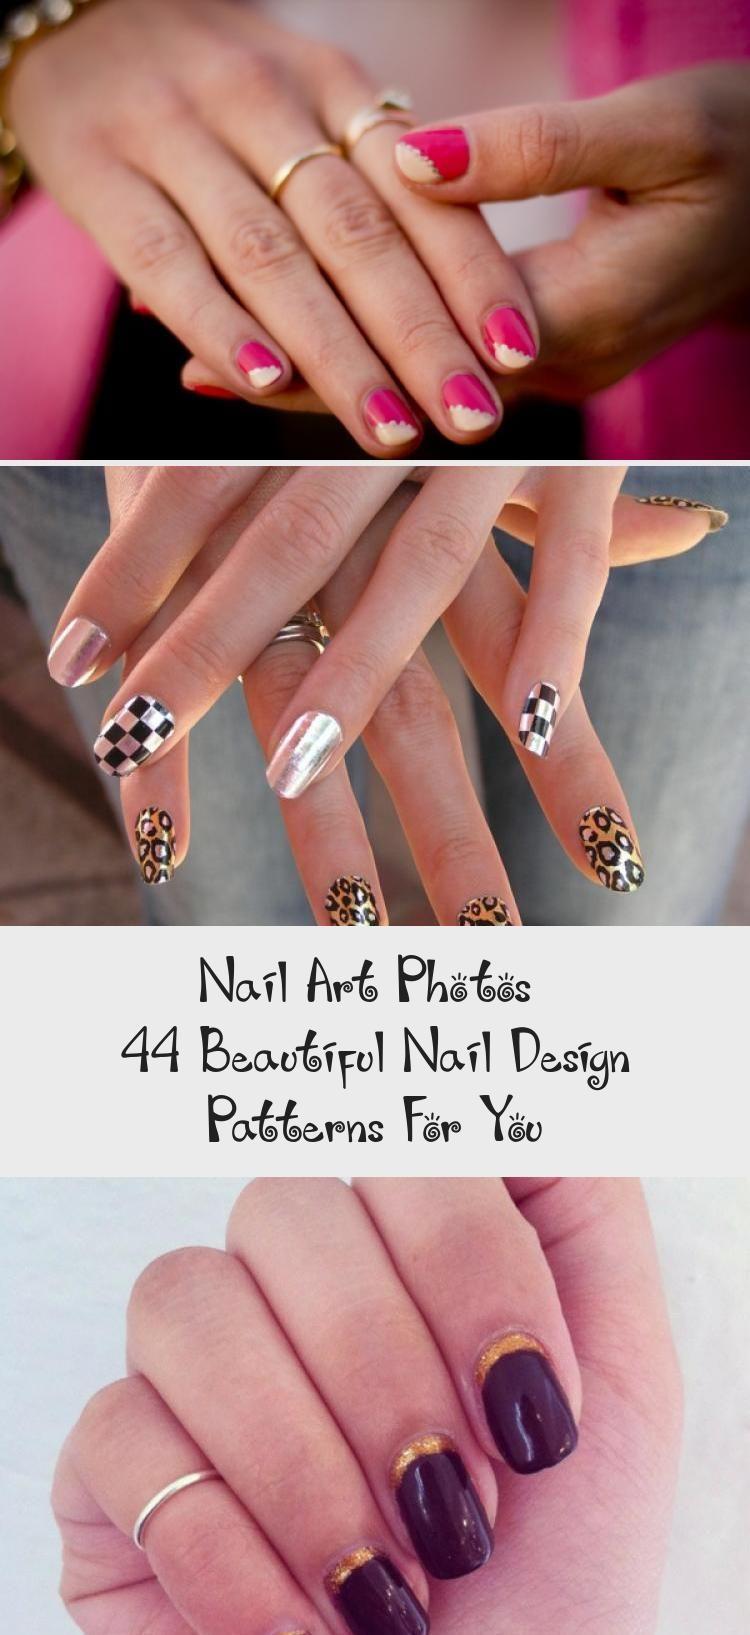 Hair Styles In 2020 Beautiful Nail Designs White Lace Nails Nail Art Photos